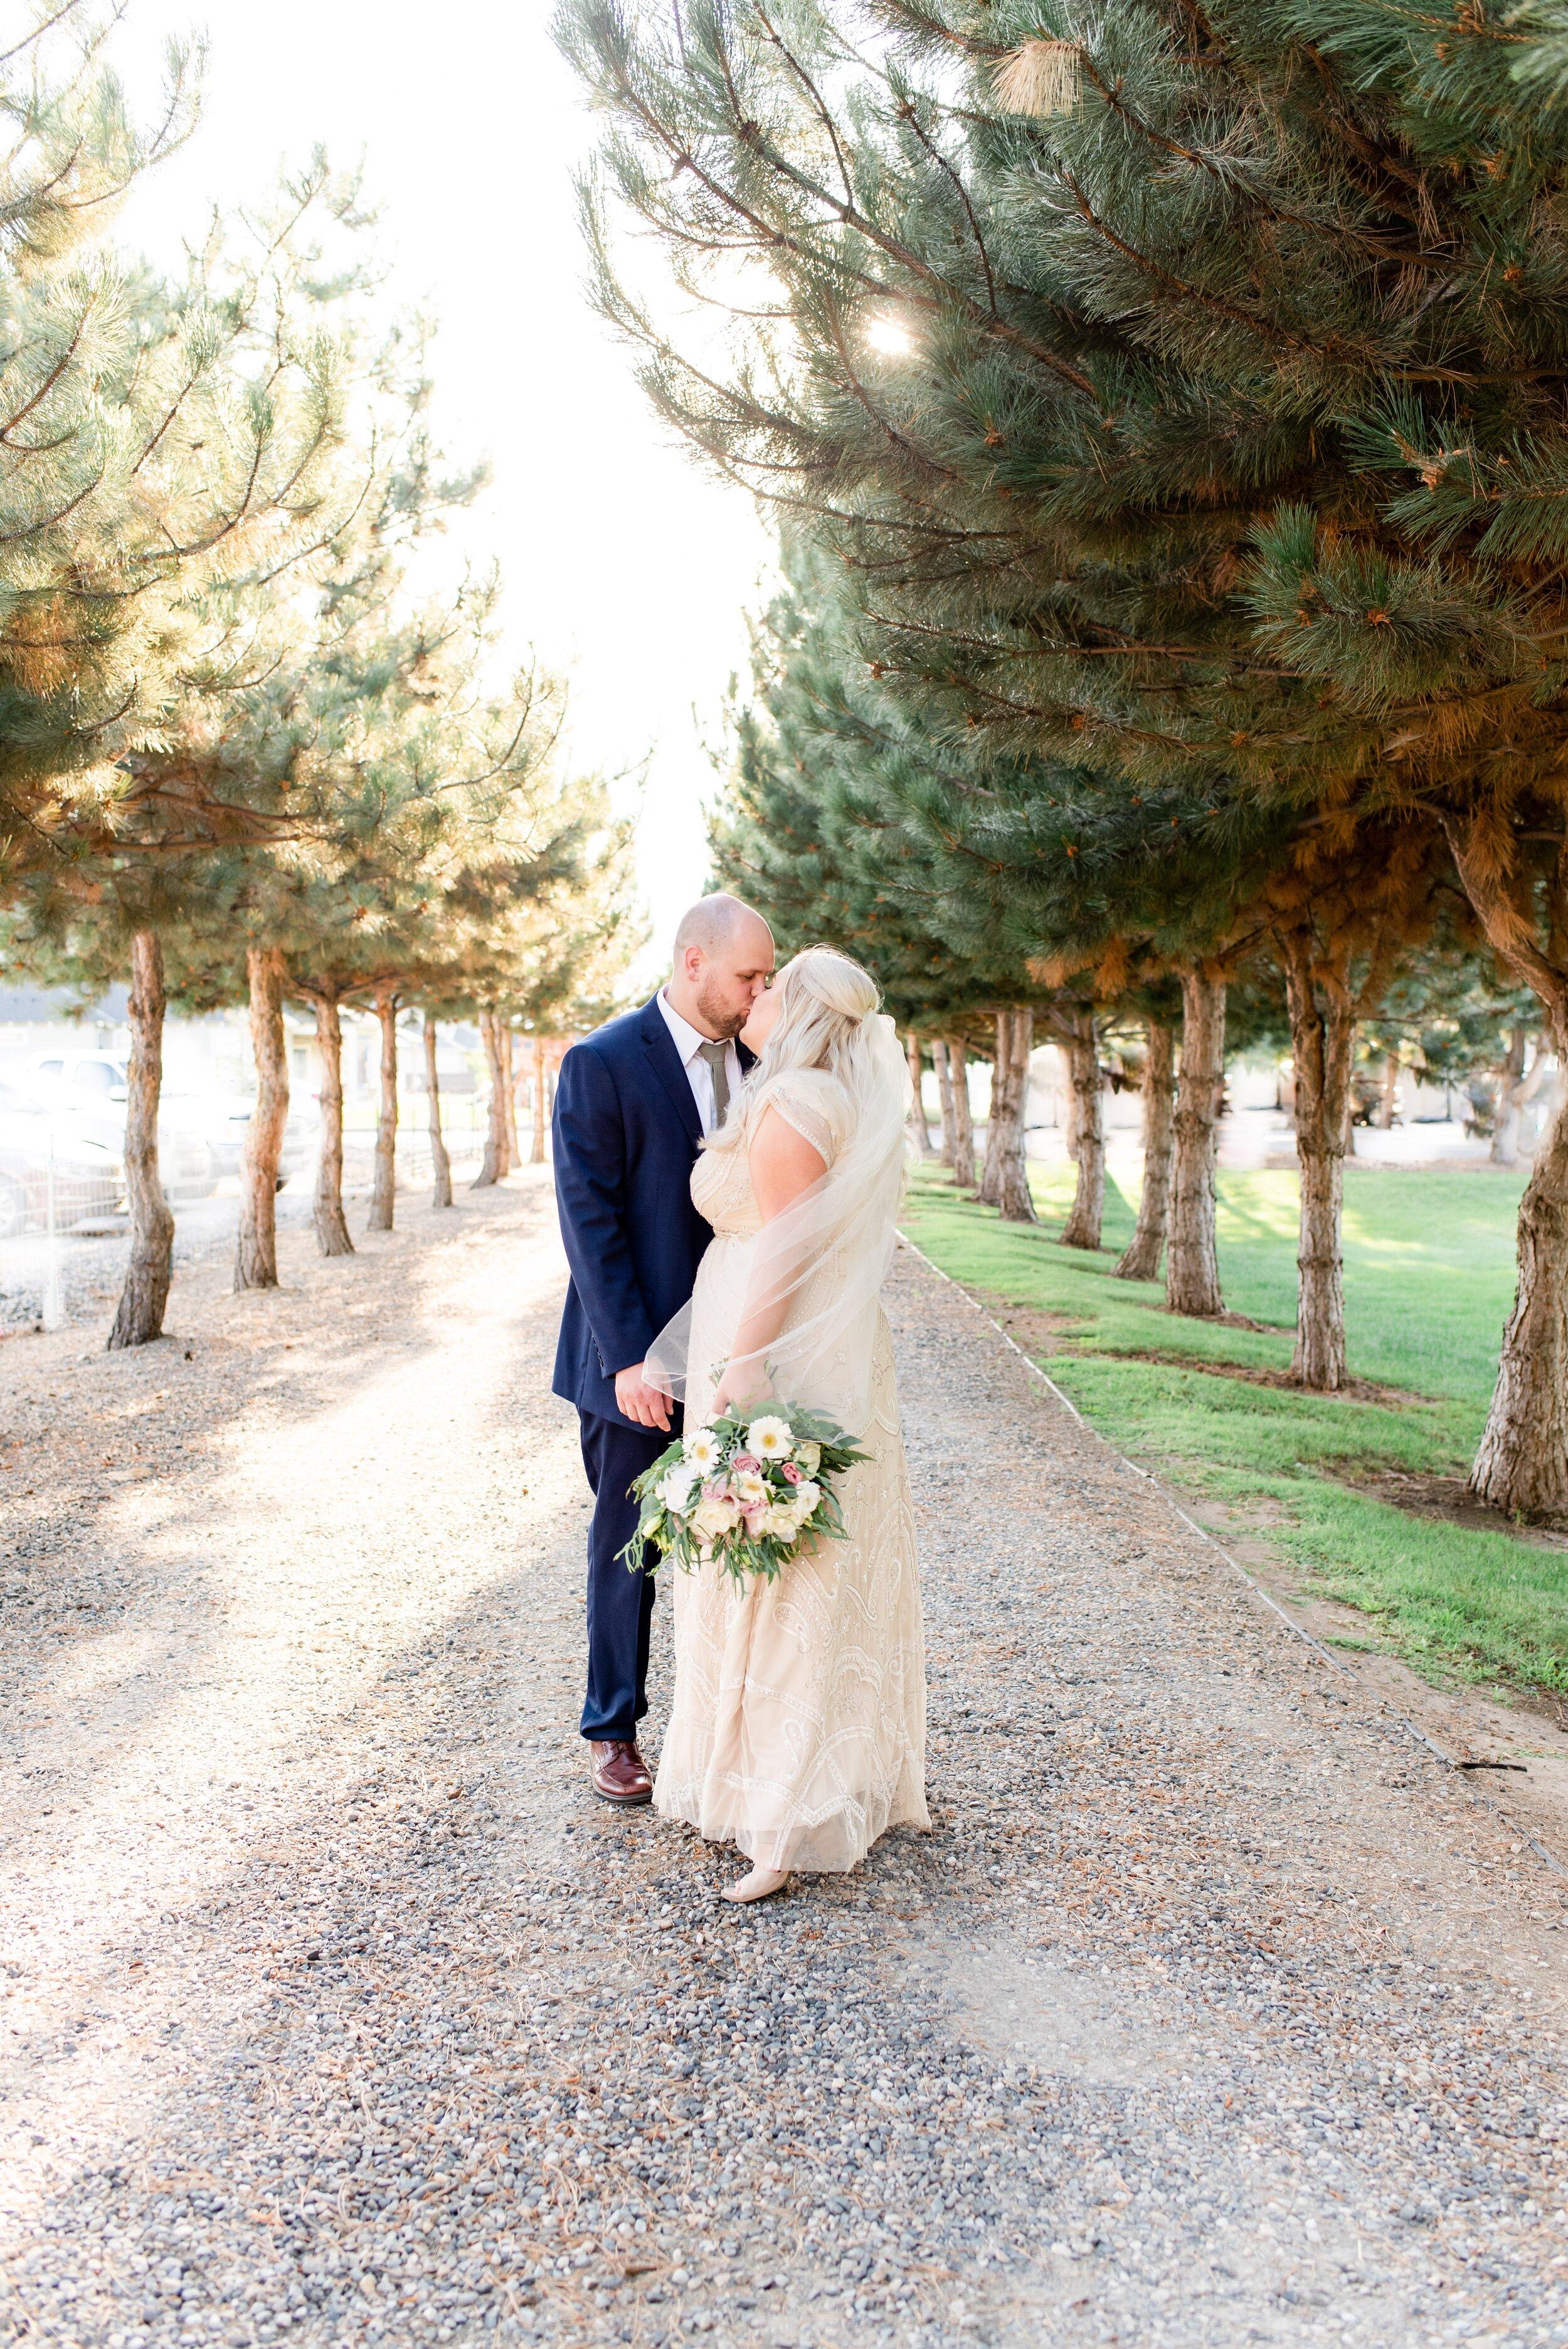 Bride & Groom Portraits in Trees- Tri Cities Wedding Photographer - Morgan Tayler Photo & Design - Tri Cities Washington Backyard Wedding